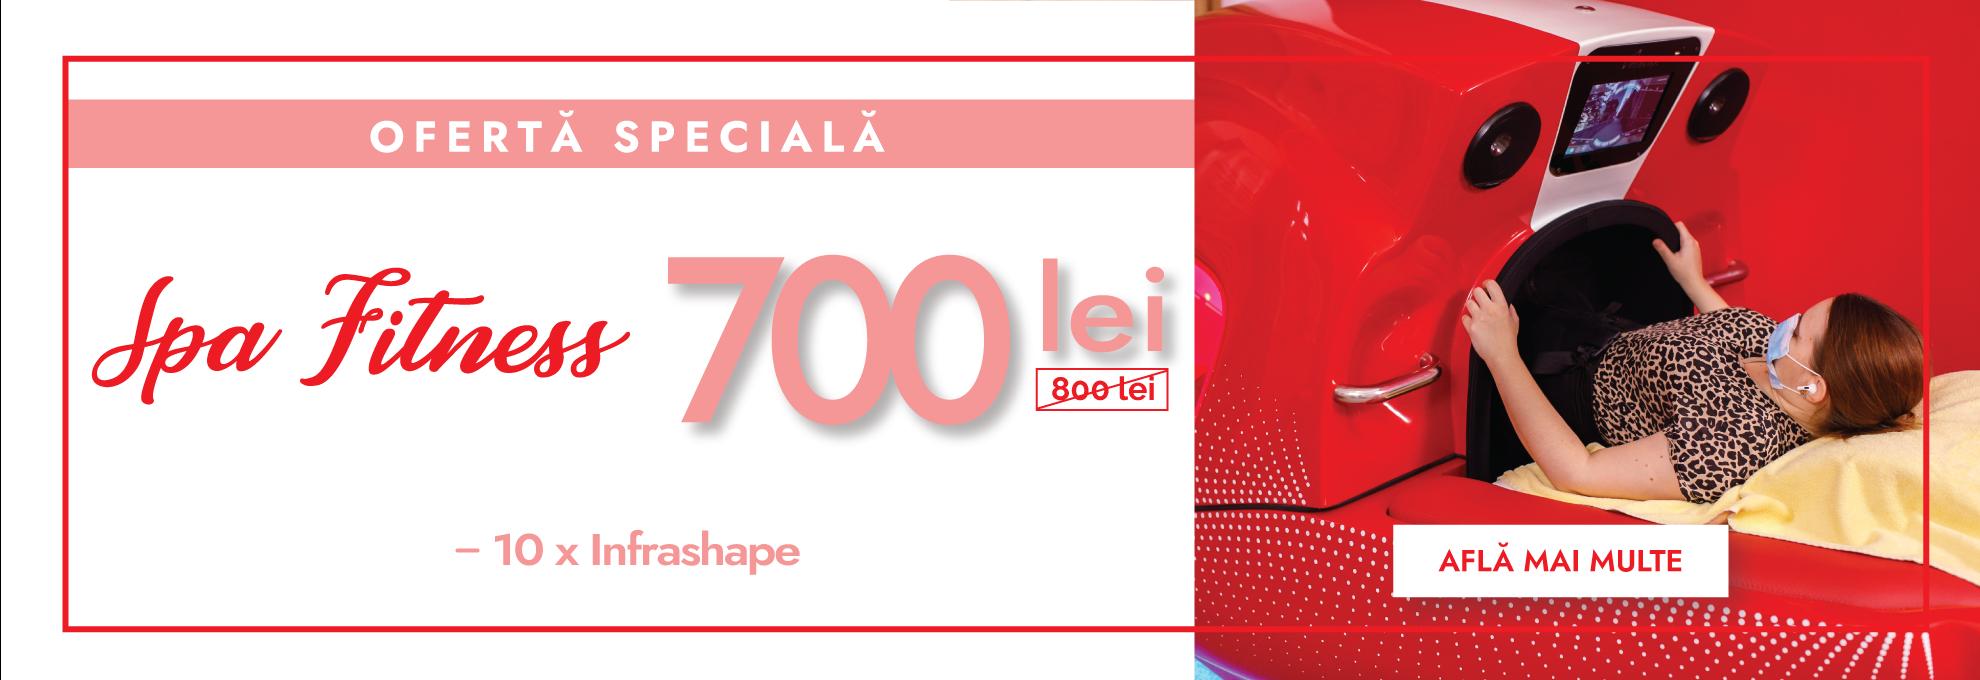 BannerSite990x340-Spafitness-Infrashape